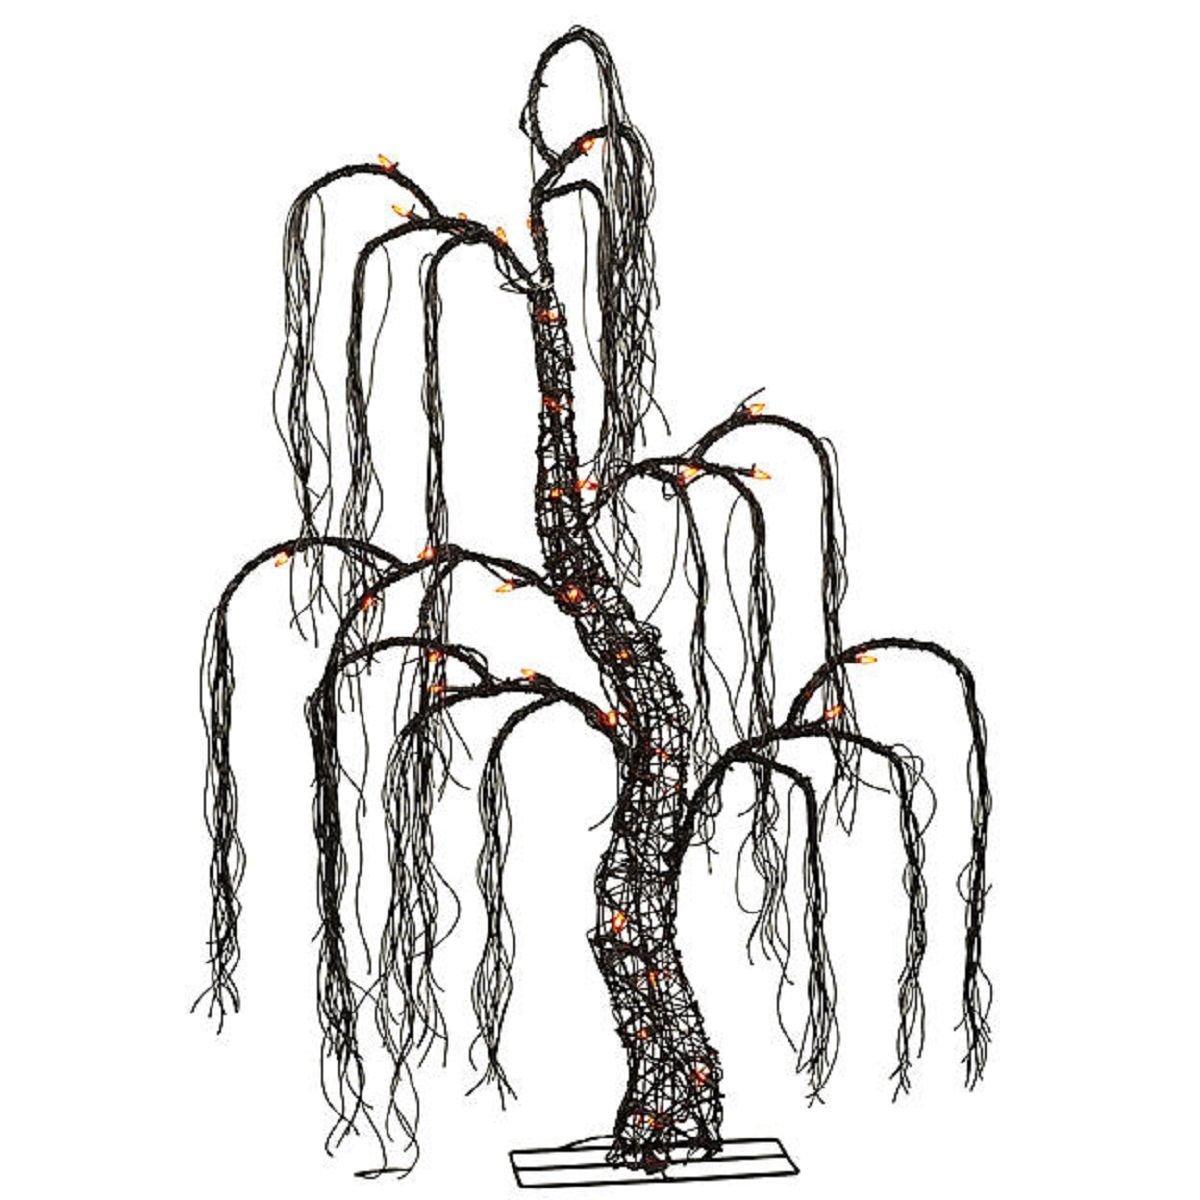 HALLOWEEN 48'' BLACK SPOOKY TREE LIGHTED YARD PROP DECORATION